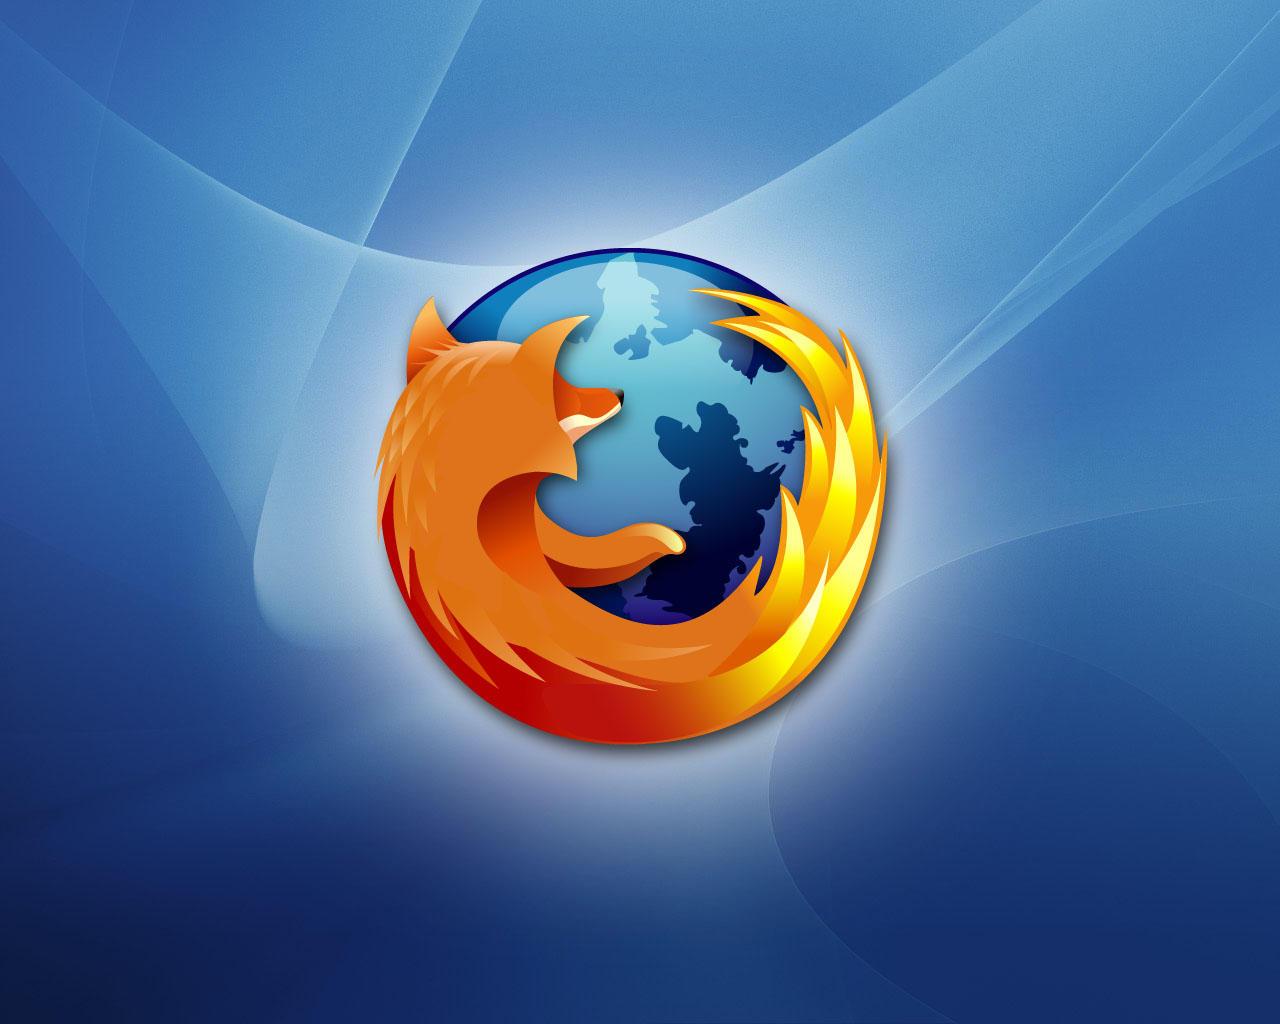 13 фишек в Firefox | ² Malevi4a: https://malevi4.wordpress.com/2007/05/22/13-фишек-в-firefox...